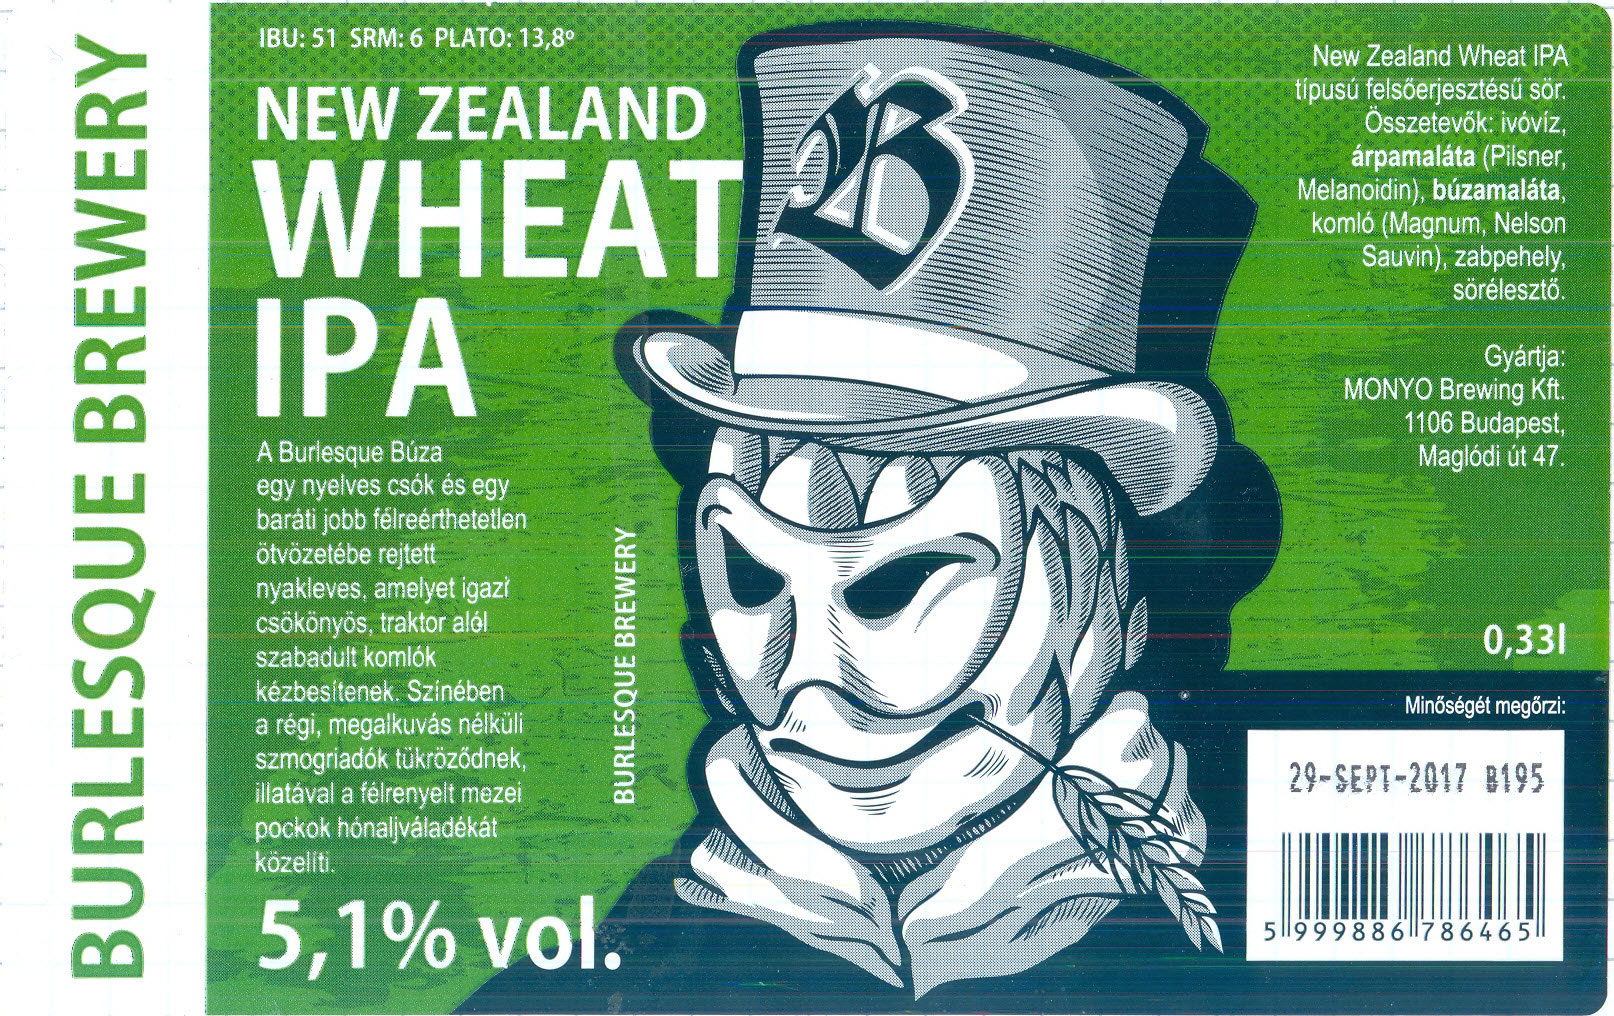 burlesque-brewery-new-zealand-wheat-ipa-20170929-033-599988678646-3423.jpg